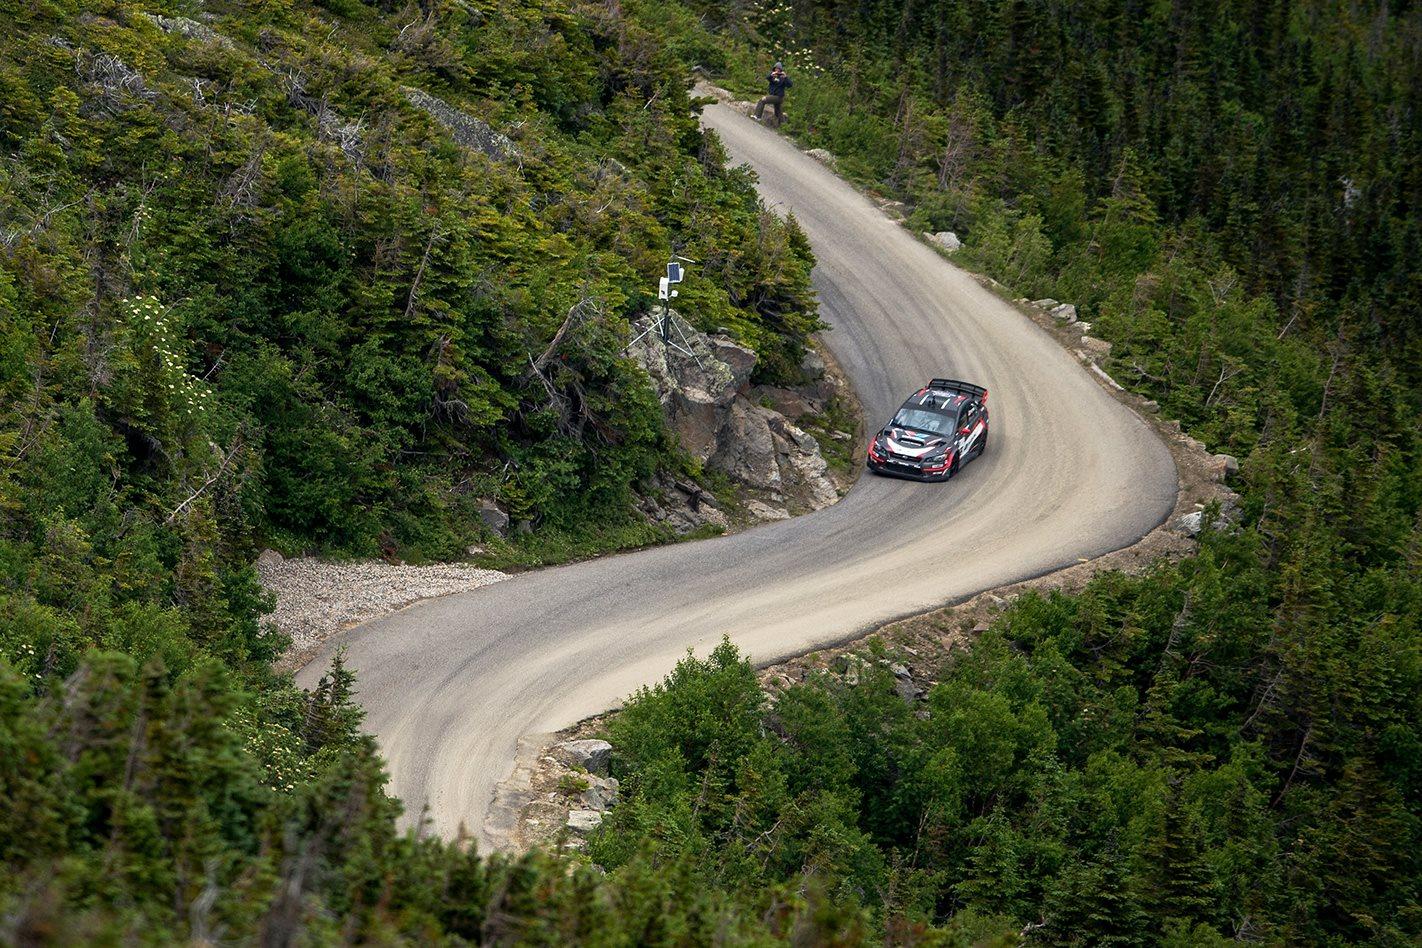 450kW Subaru WRX STI on Mt Washington